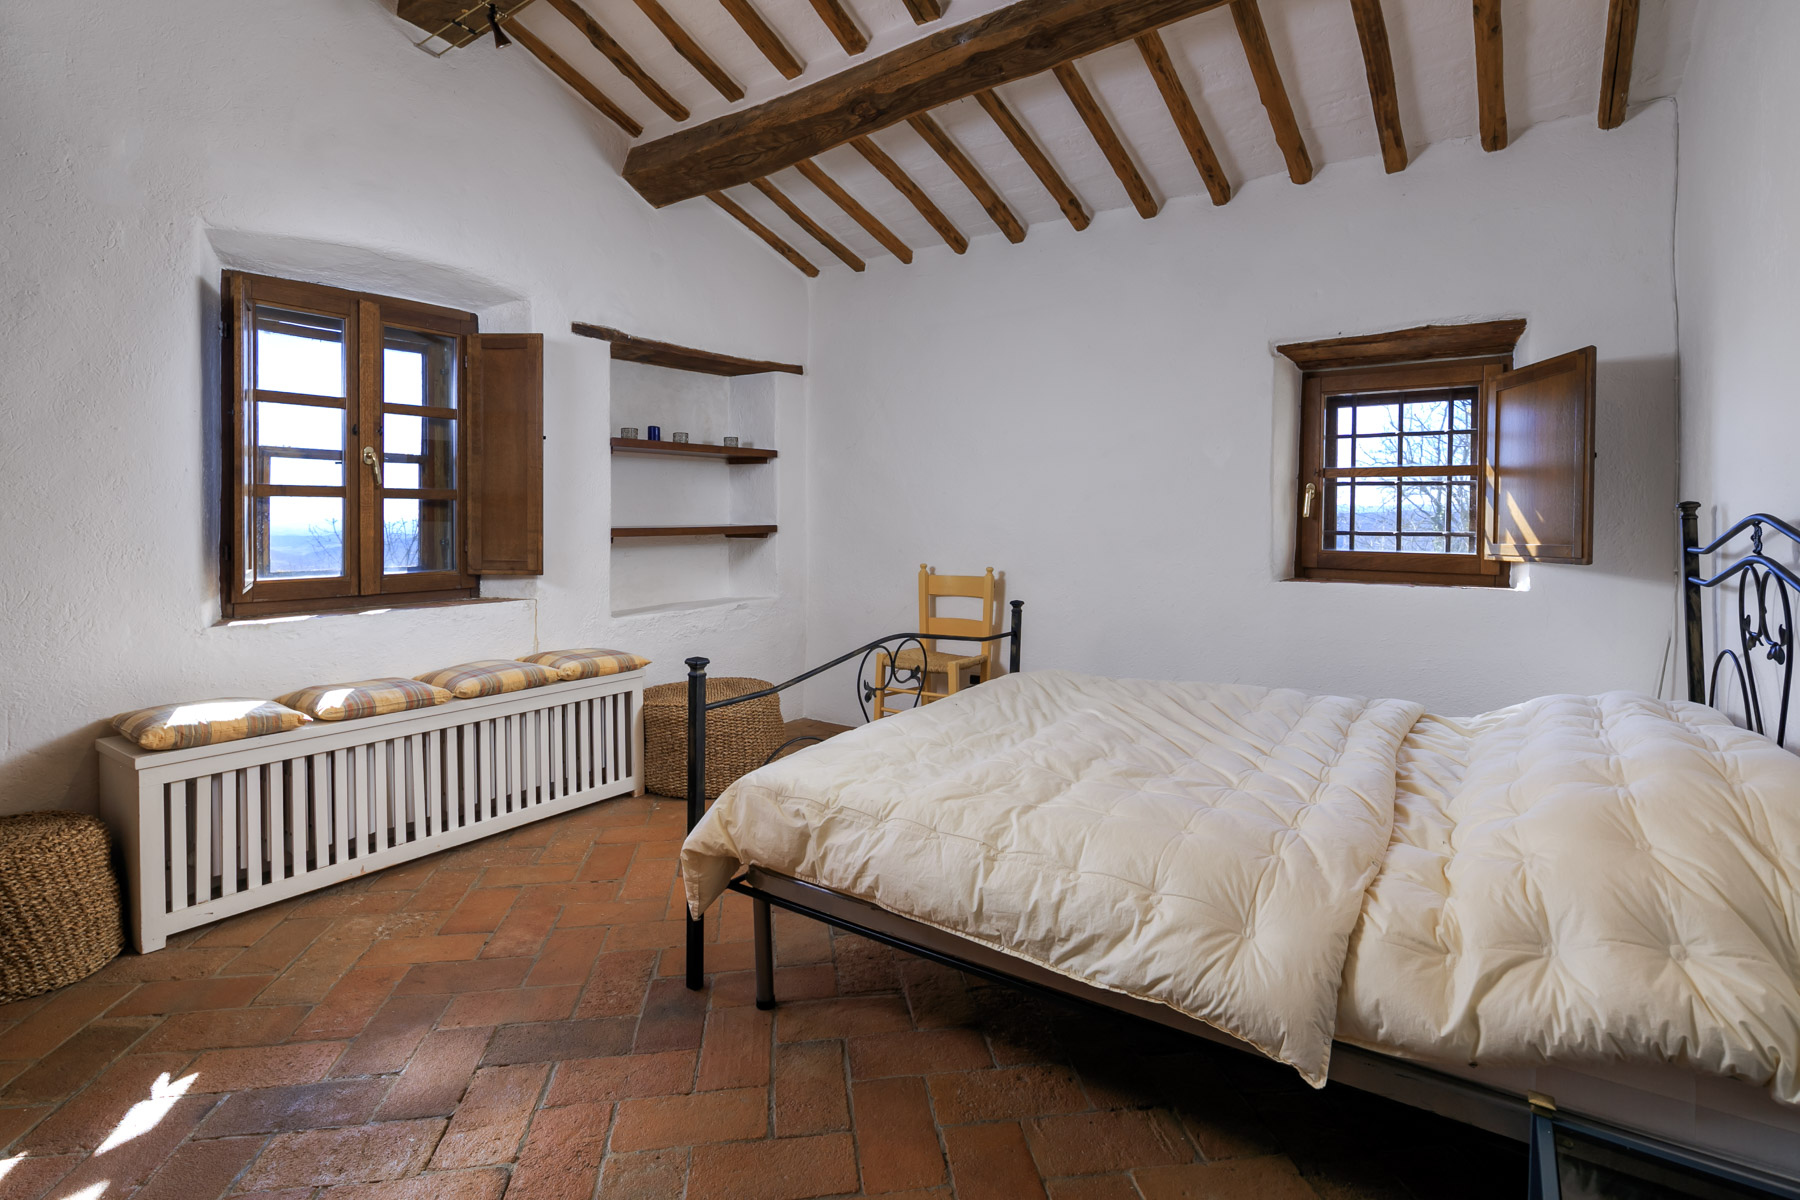 Villa in Vendita a Gaiole In Chianti: 5 locali, 465 mq - Foto 26